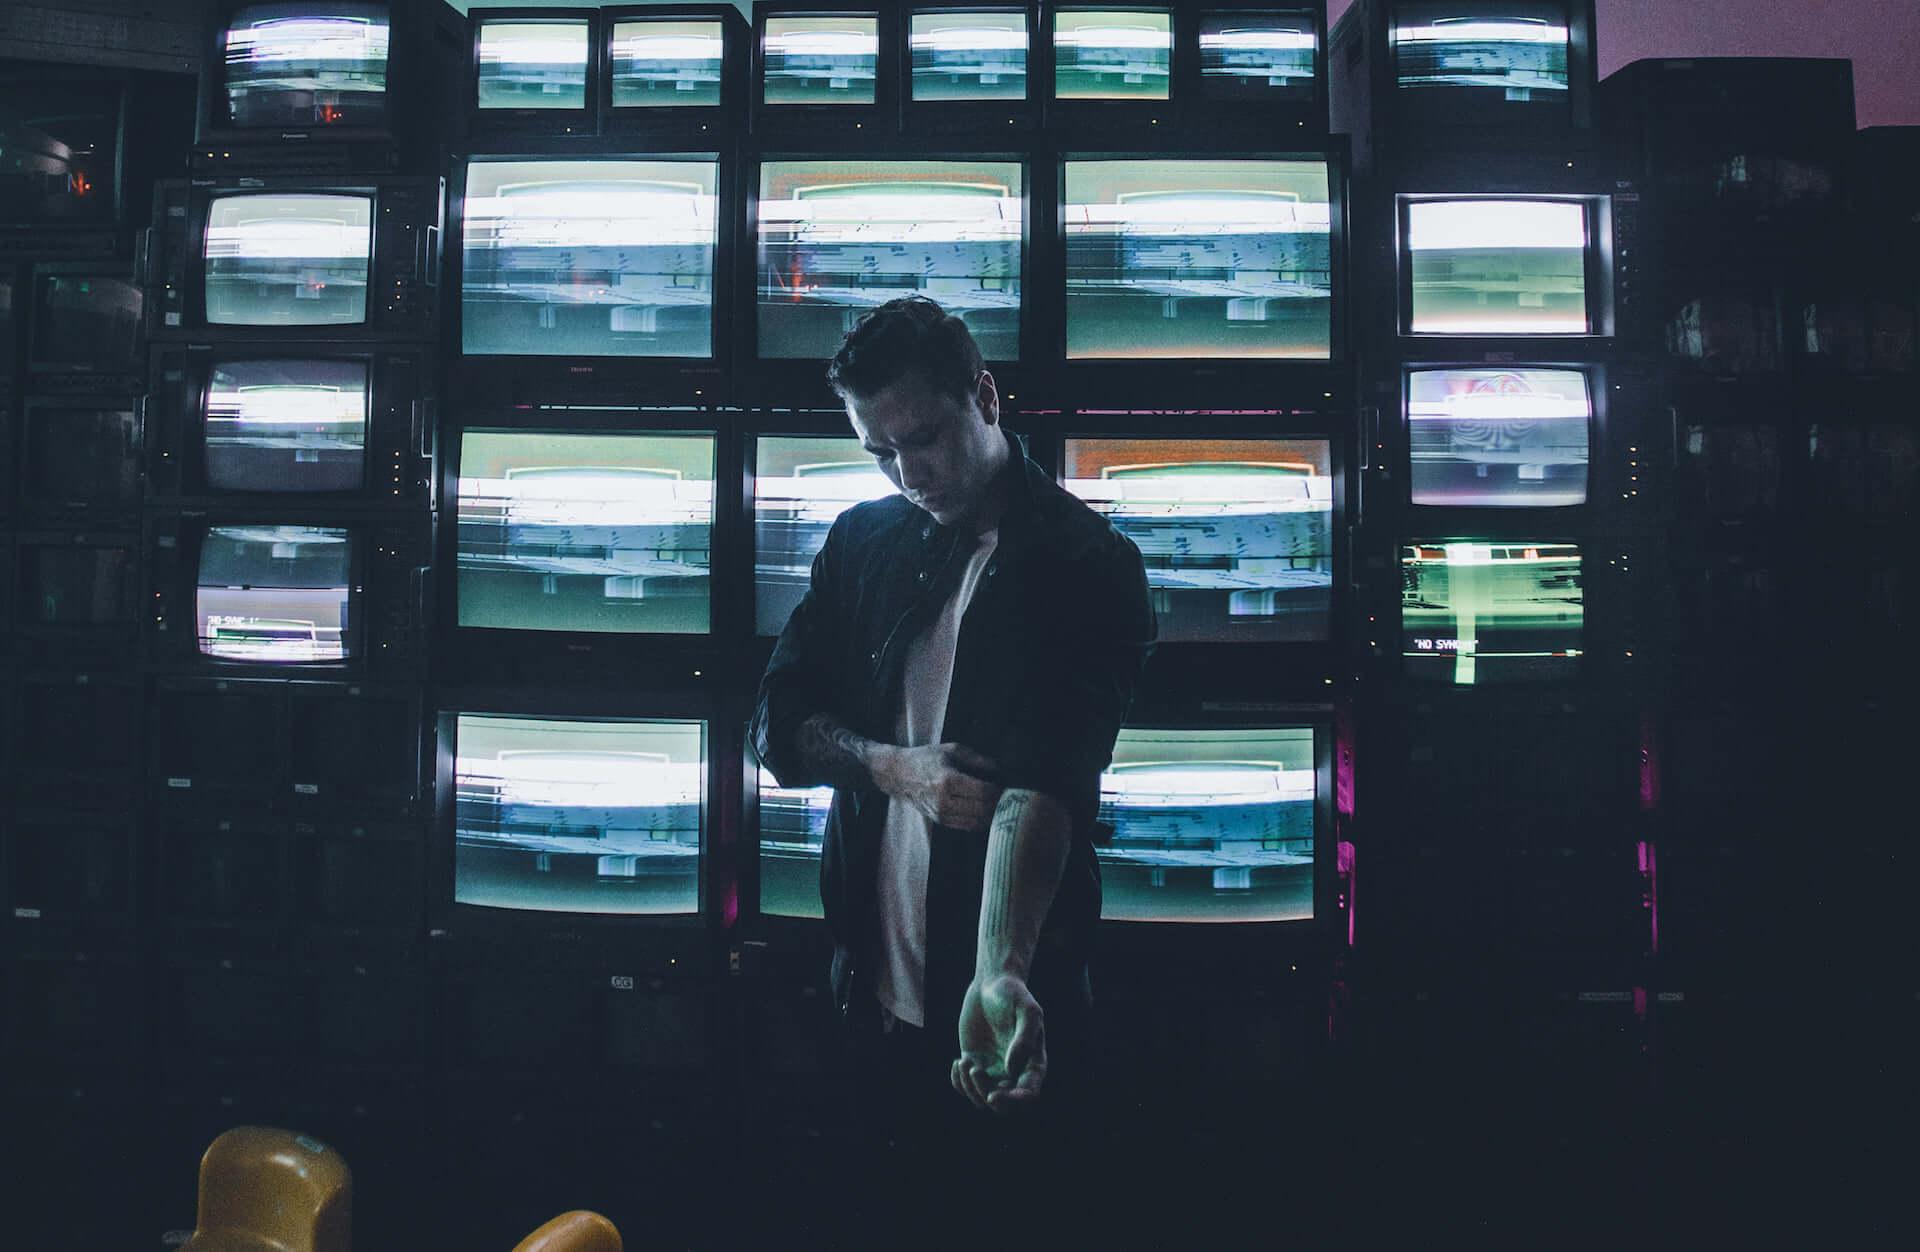 <EDC Las Vegas 2019>で華々しいデビューを飾った新鋭プロデューサー・DILLON NATHANIELが<EDGE HOUSE>に登場 music190803_edgehouse_dillonnathaniel_main.jpg-1920x1252